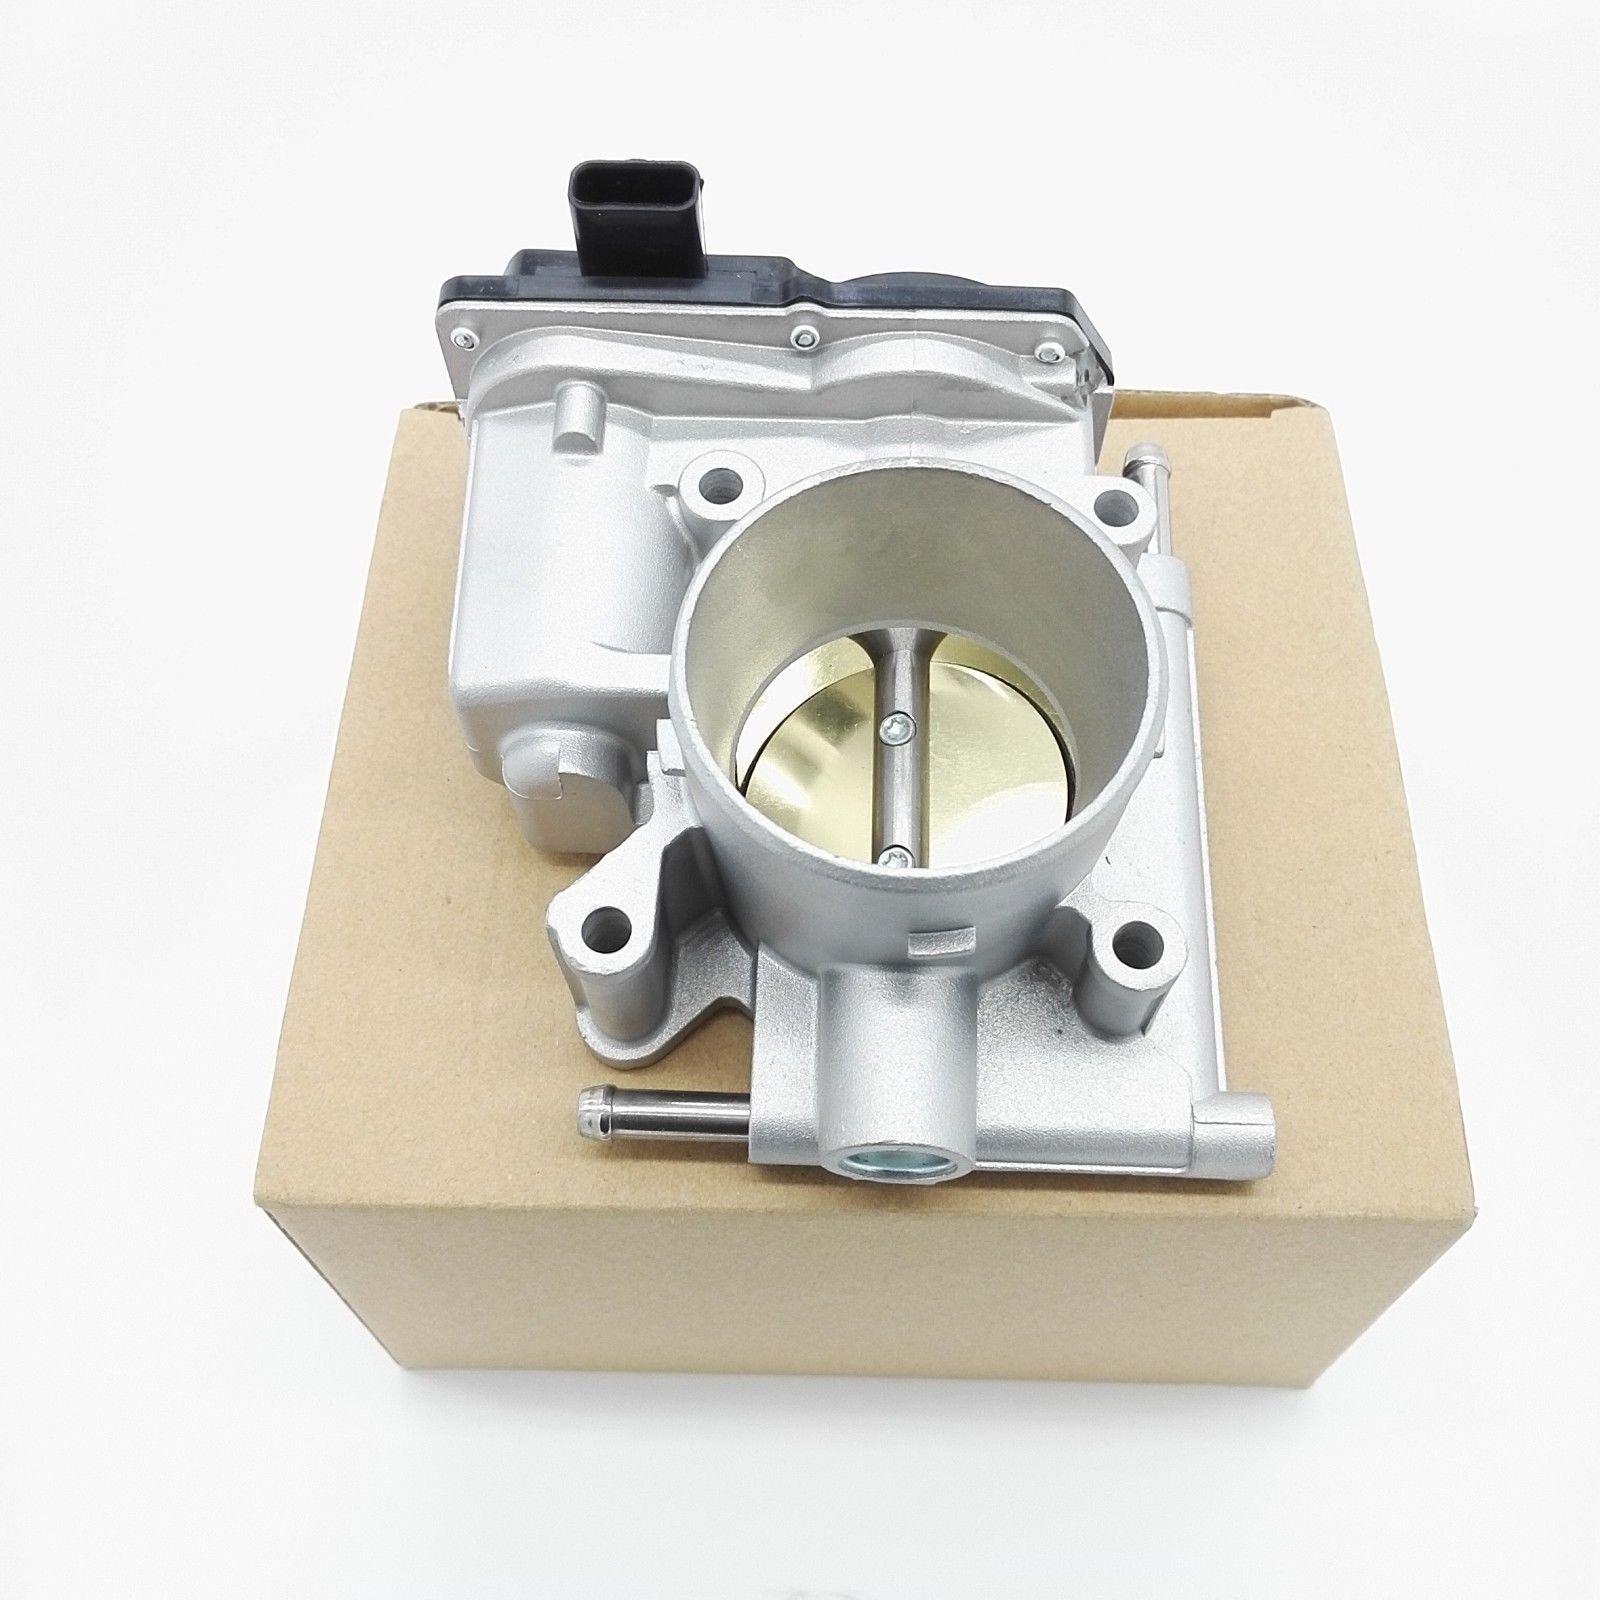 Fuel Injection Throttle Body For Mazda 3 Mazda 5 Mazda 6 2.0L 2.3L Non-Turbo L3R413640 by Nova Parts Sales